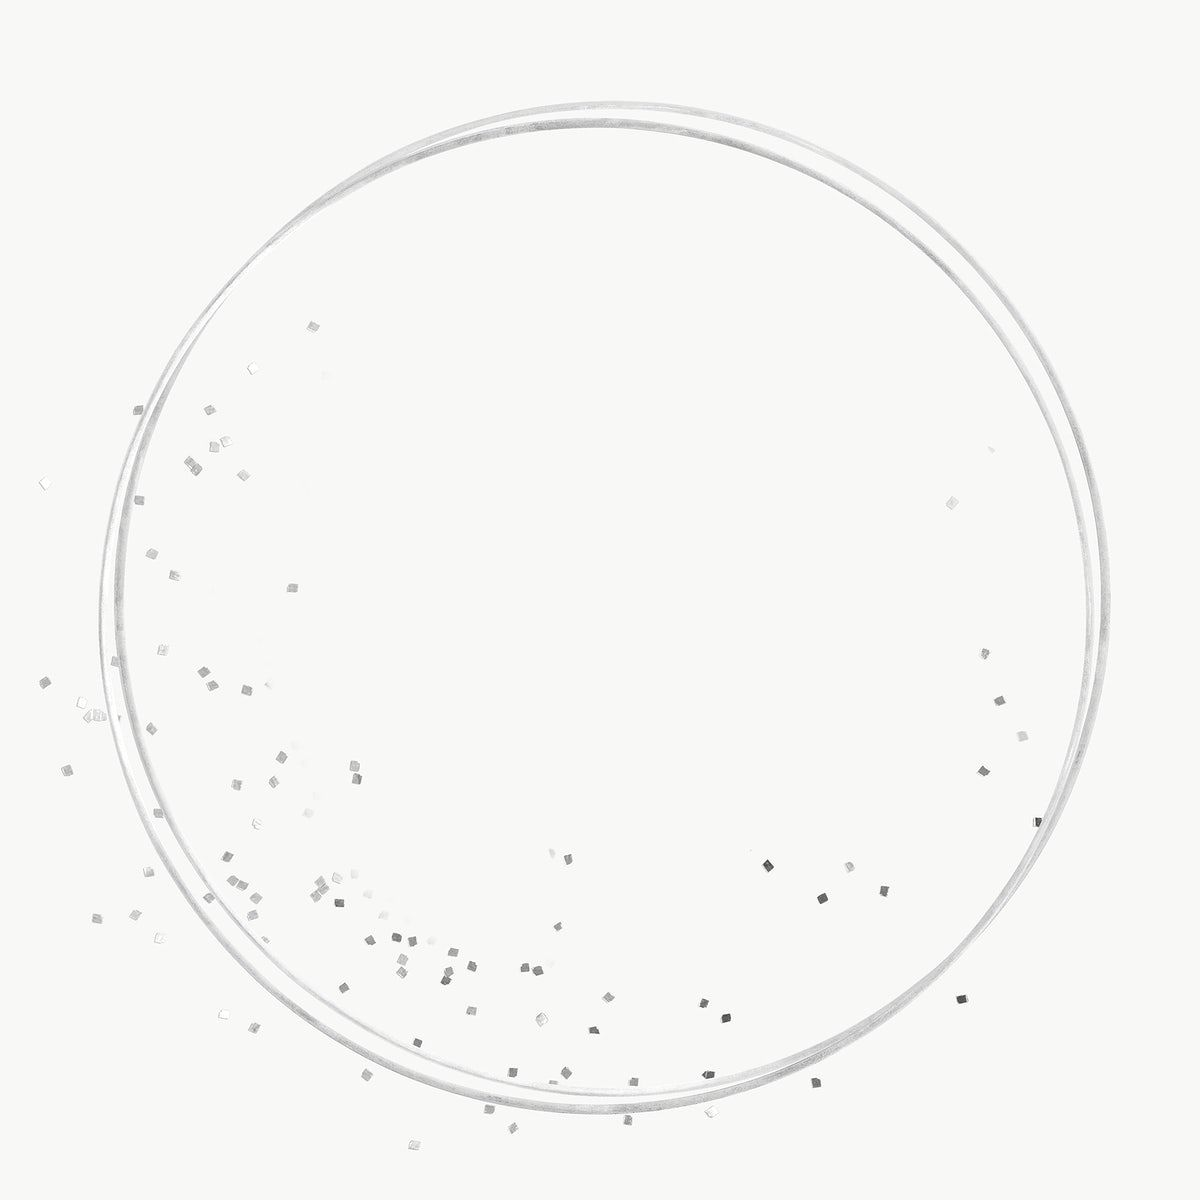 Pin By Victory On Instagram Frame Design Design Element Glitter Frame